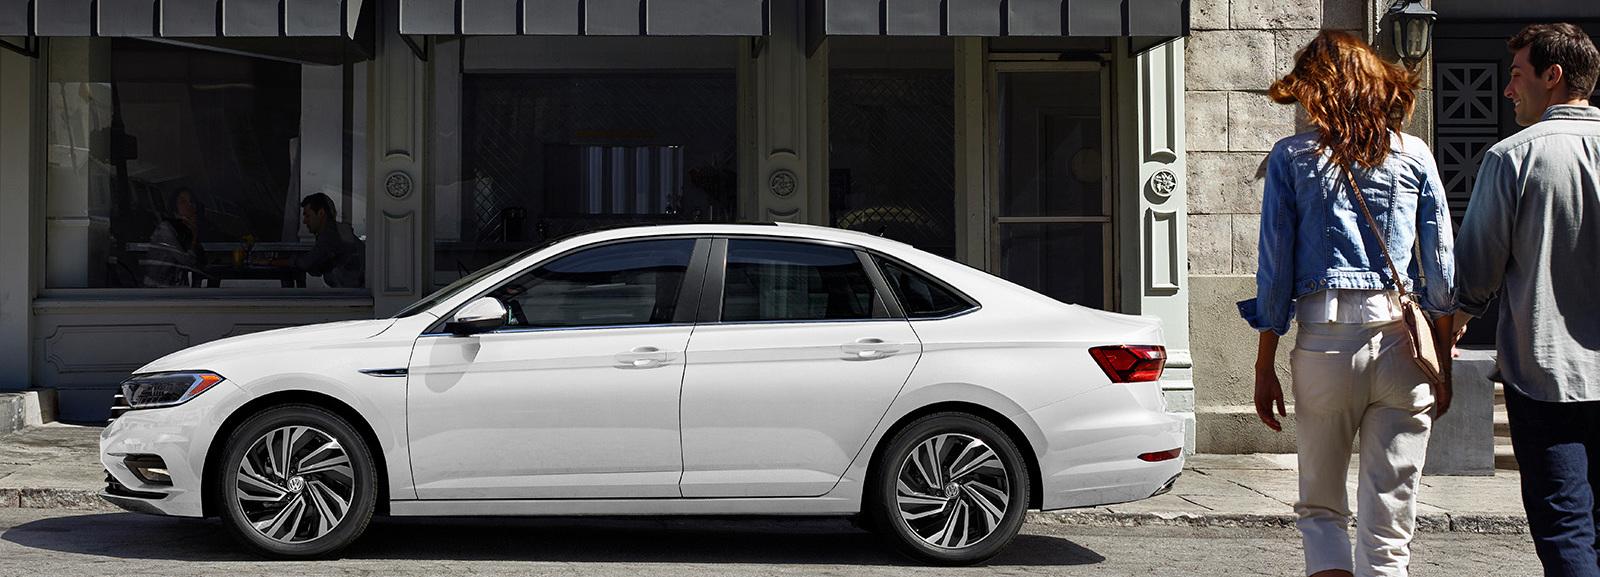 Volkswagen Jetta 2020 a la venta cerca de Washington, DC